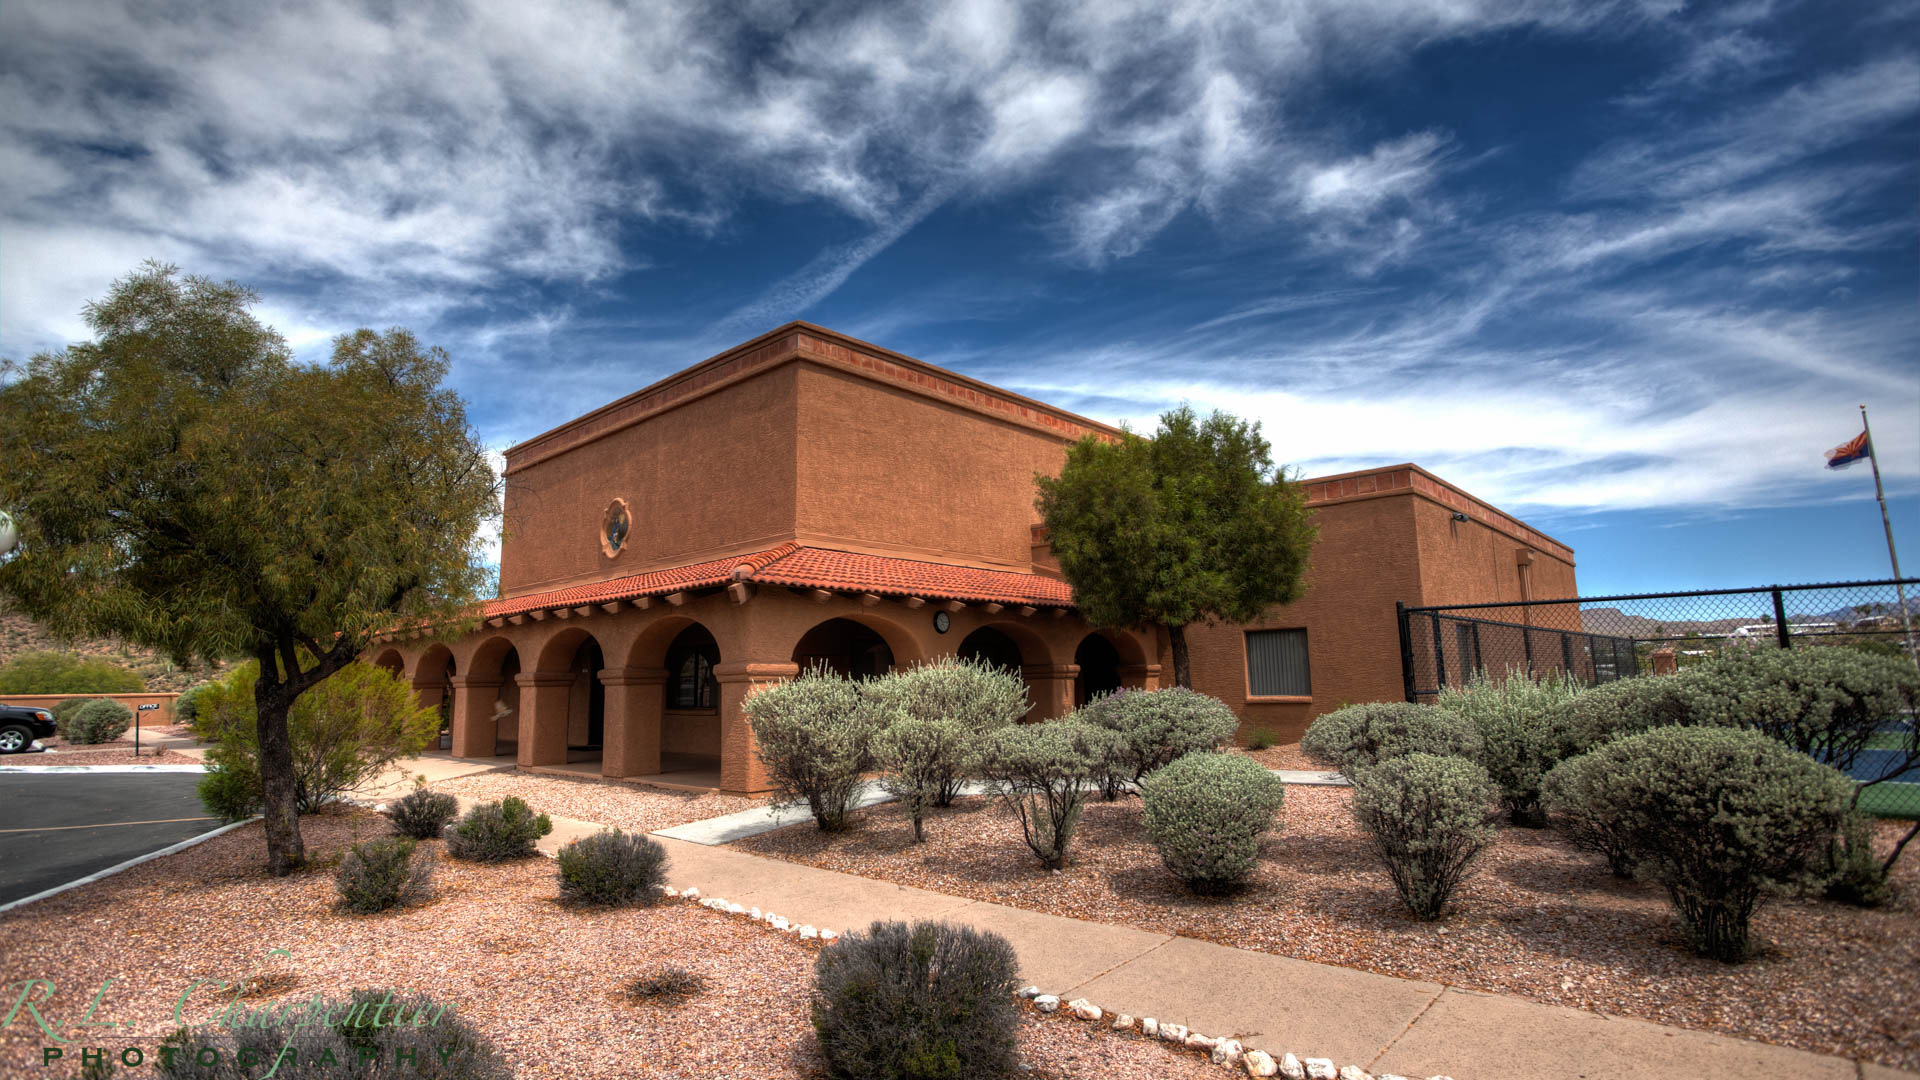 Clubhouse, Queen Valley RV Resort, Arizona